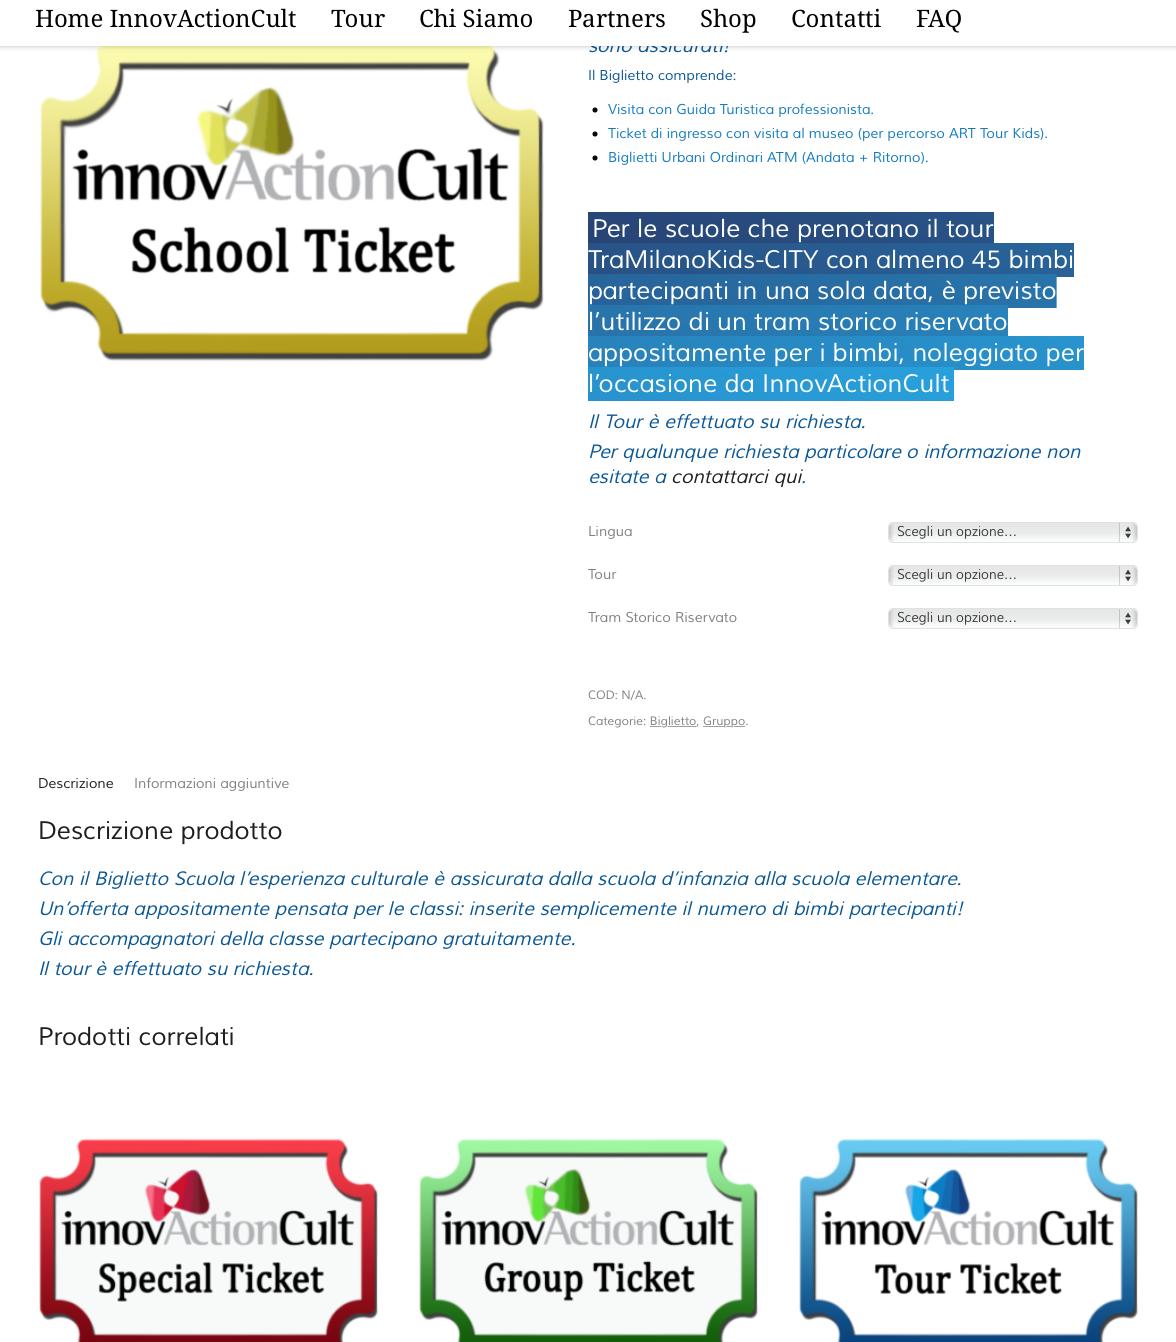 InnovActionCult Geofelix